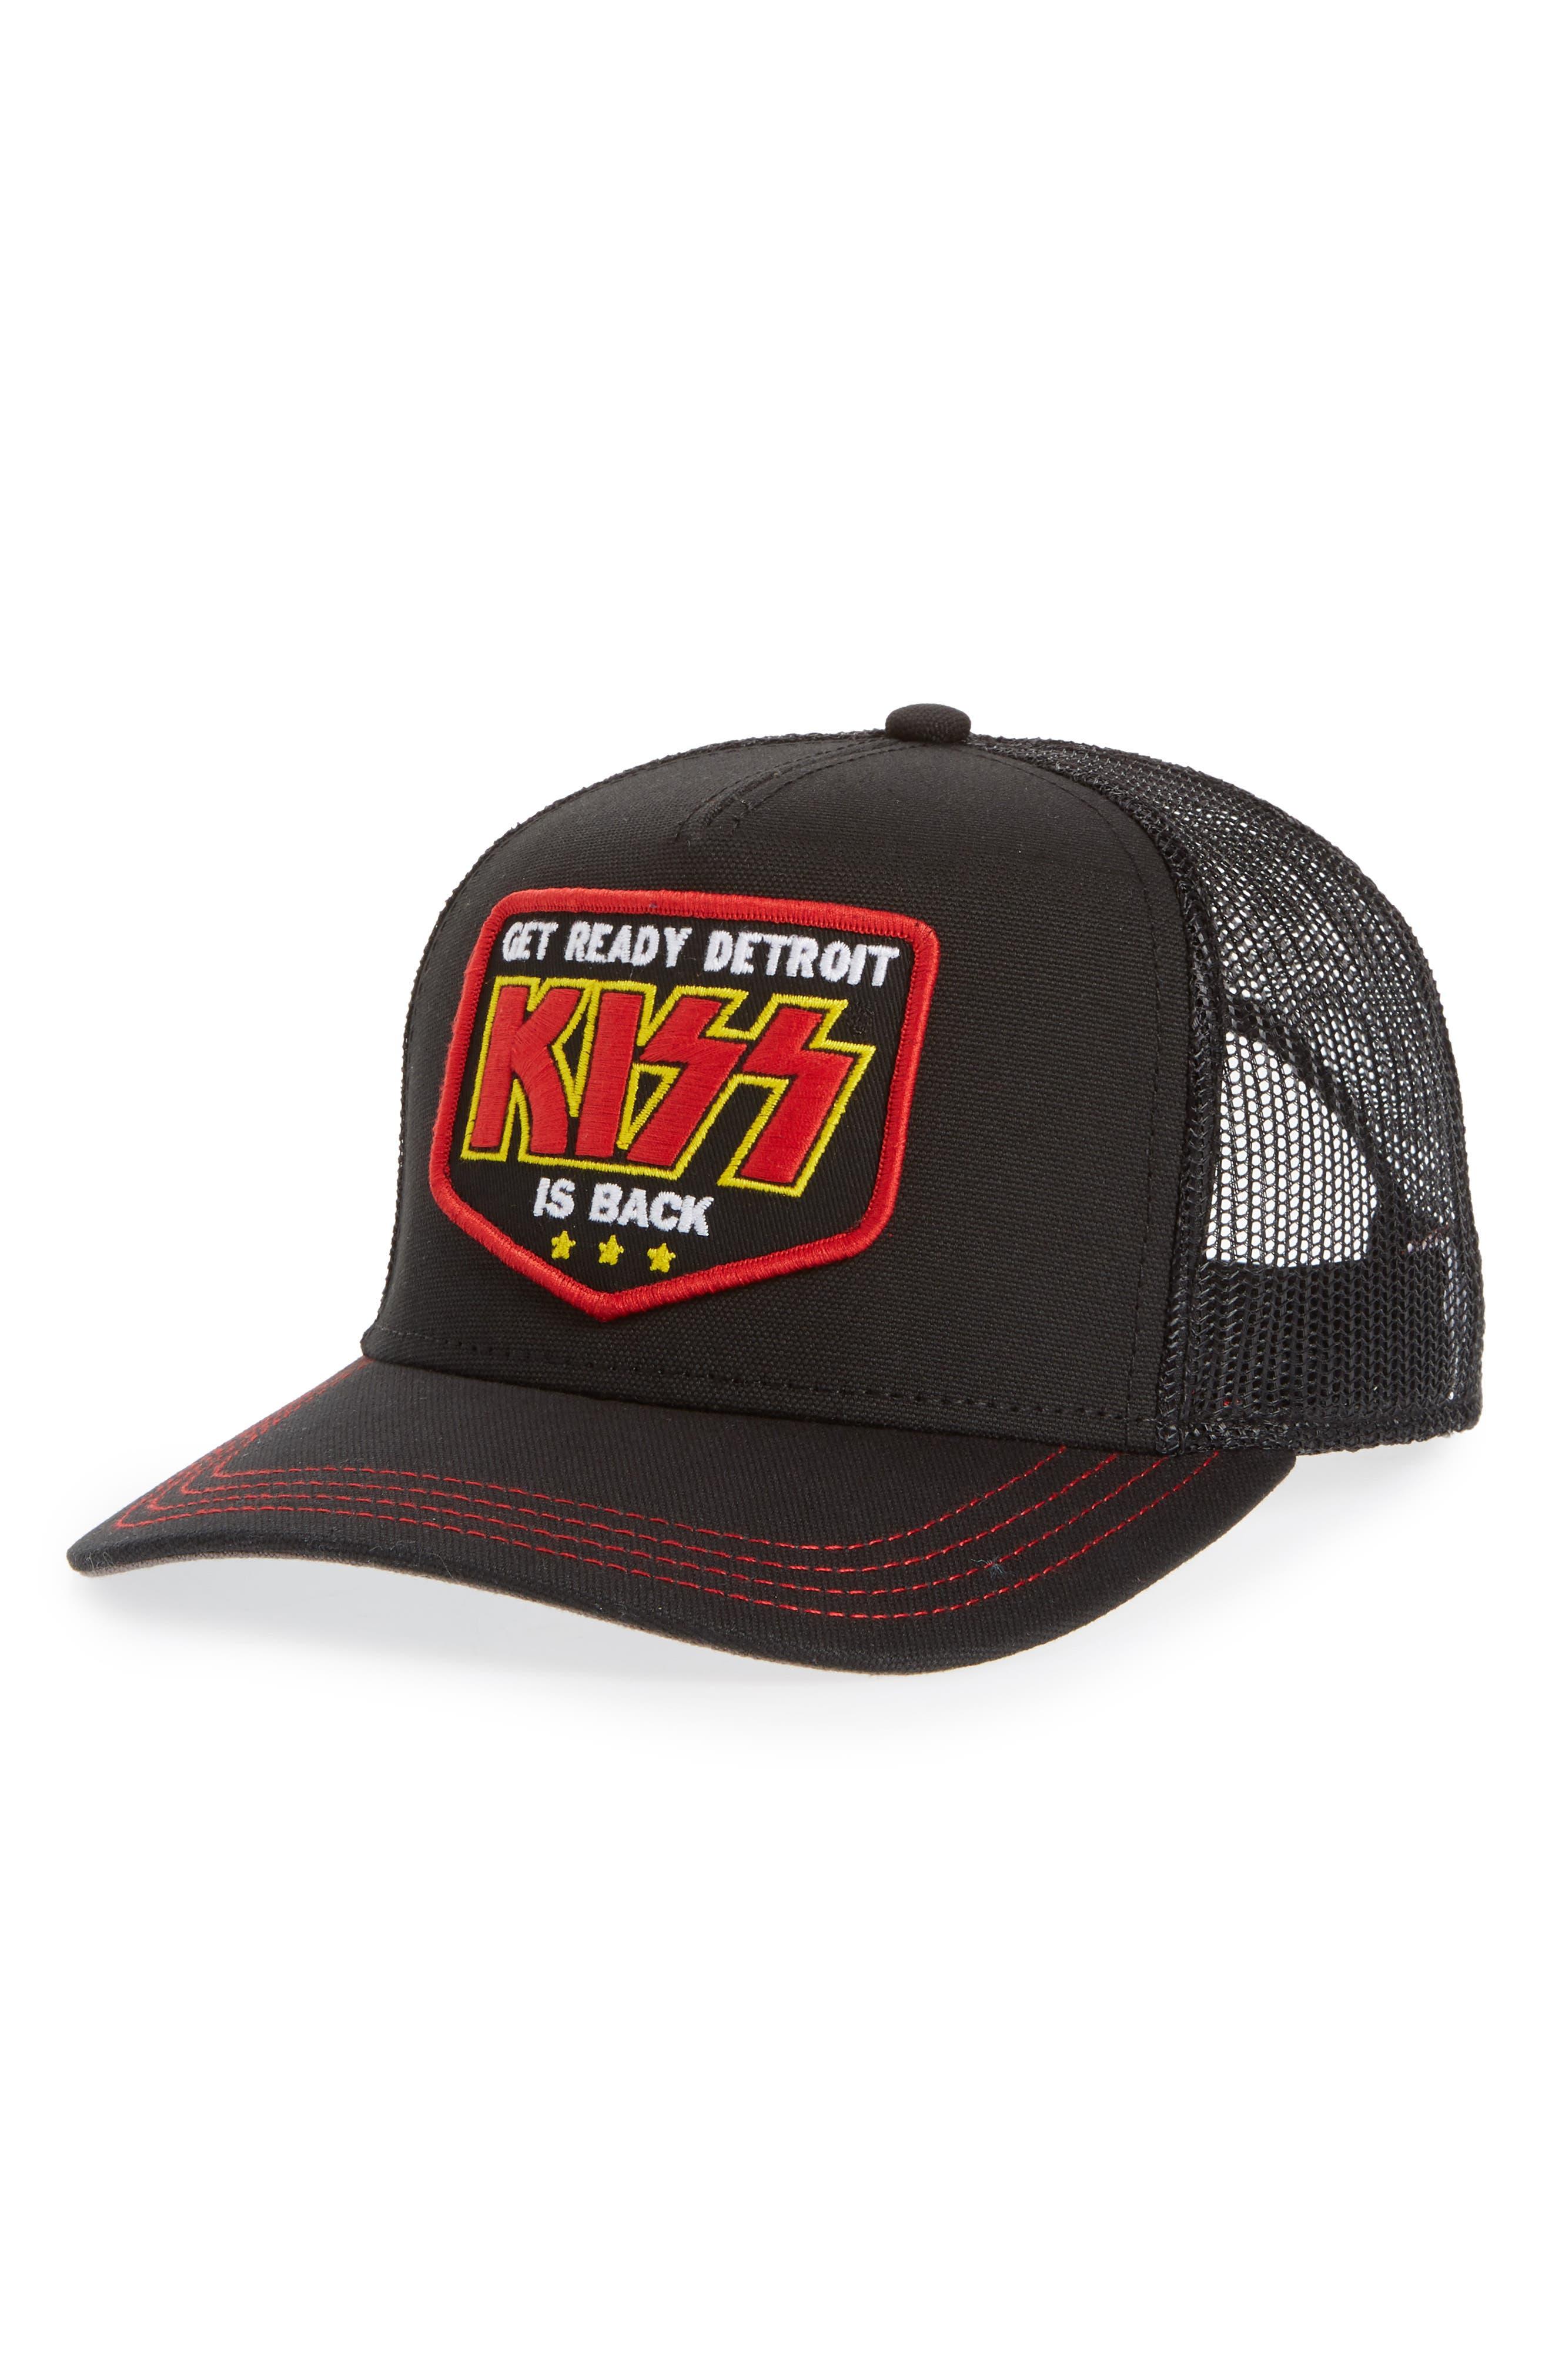 Valin KISS Trucker Hat,                         Main,                         color, 001